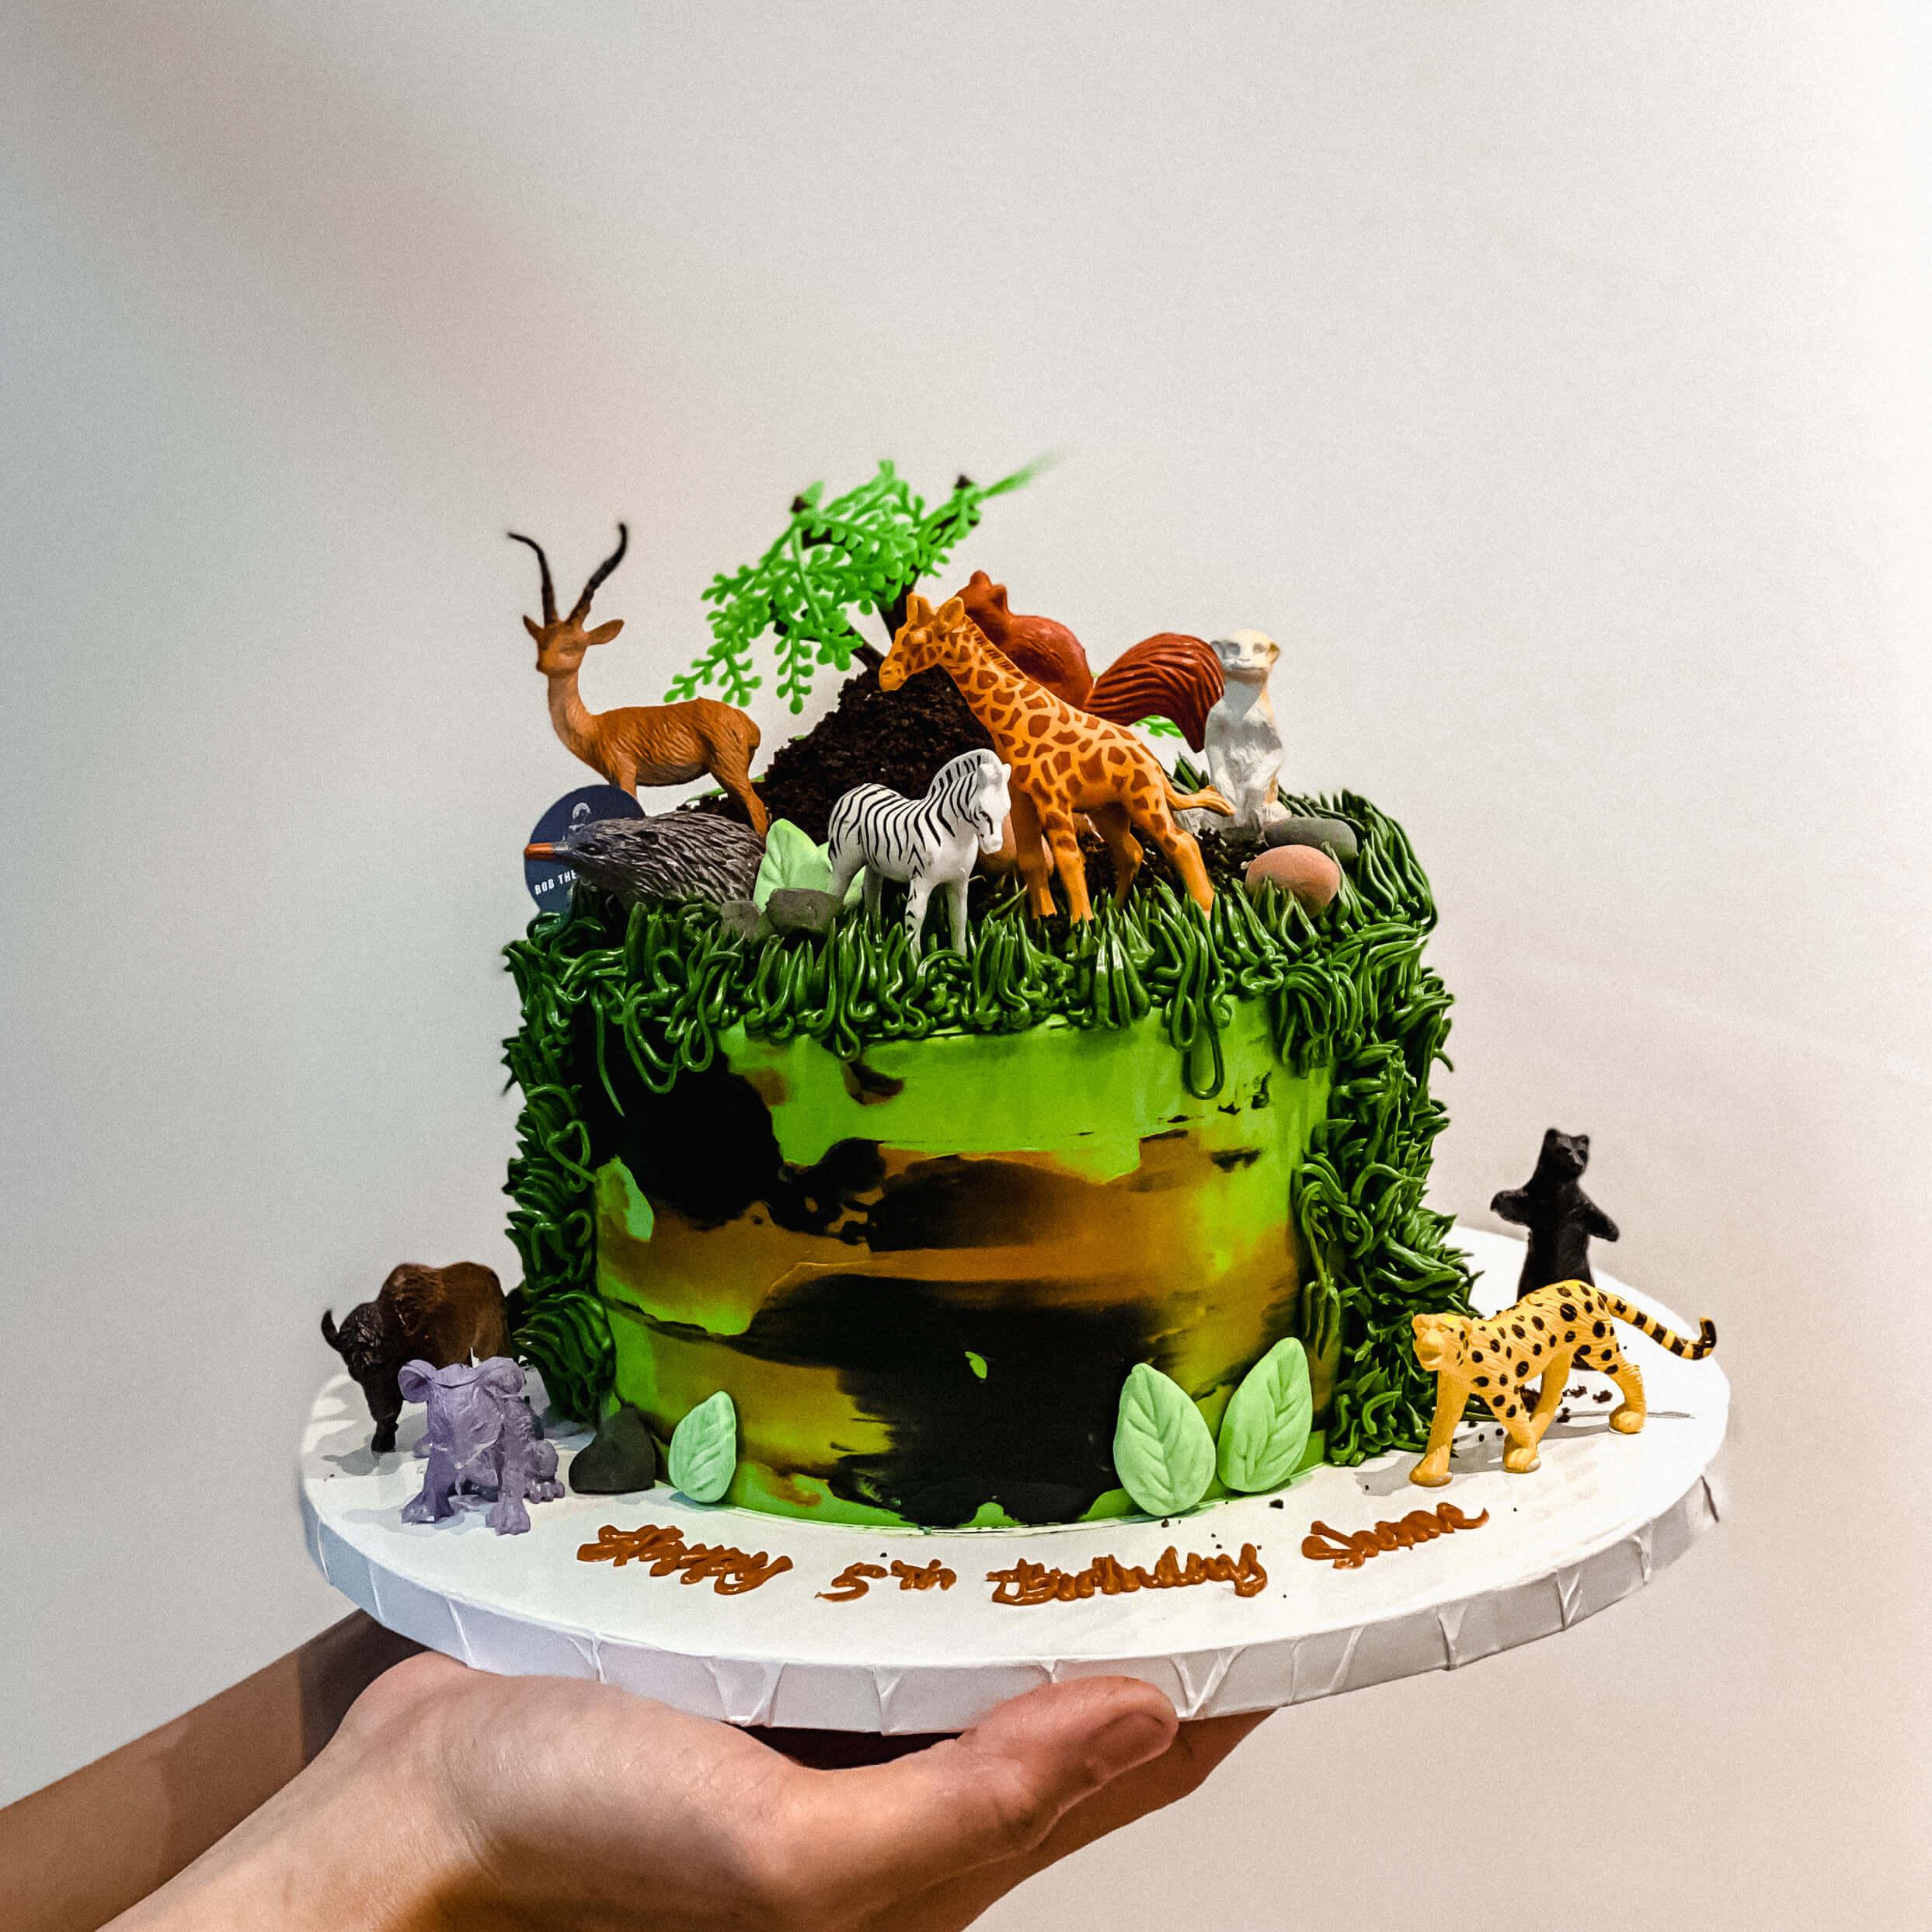 Jungle Cake with Wild Animal Toys